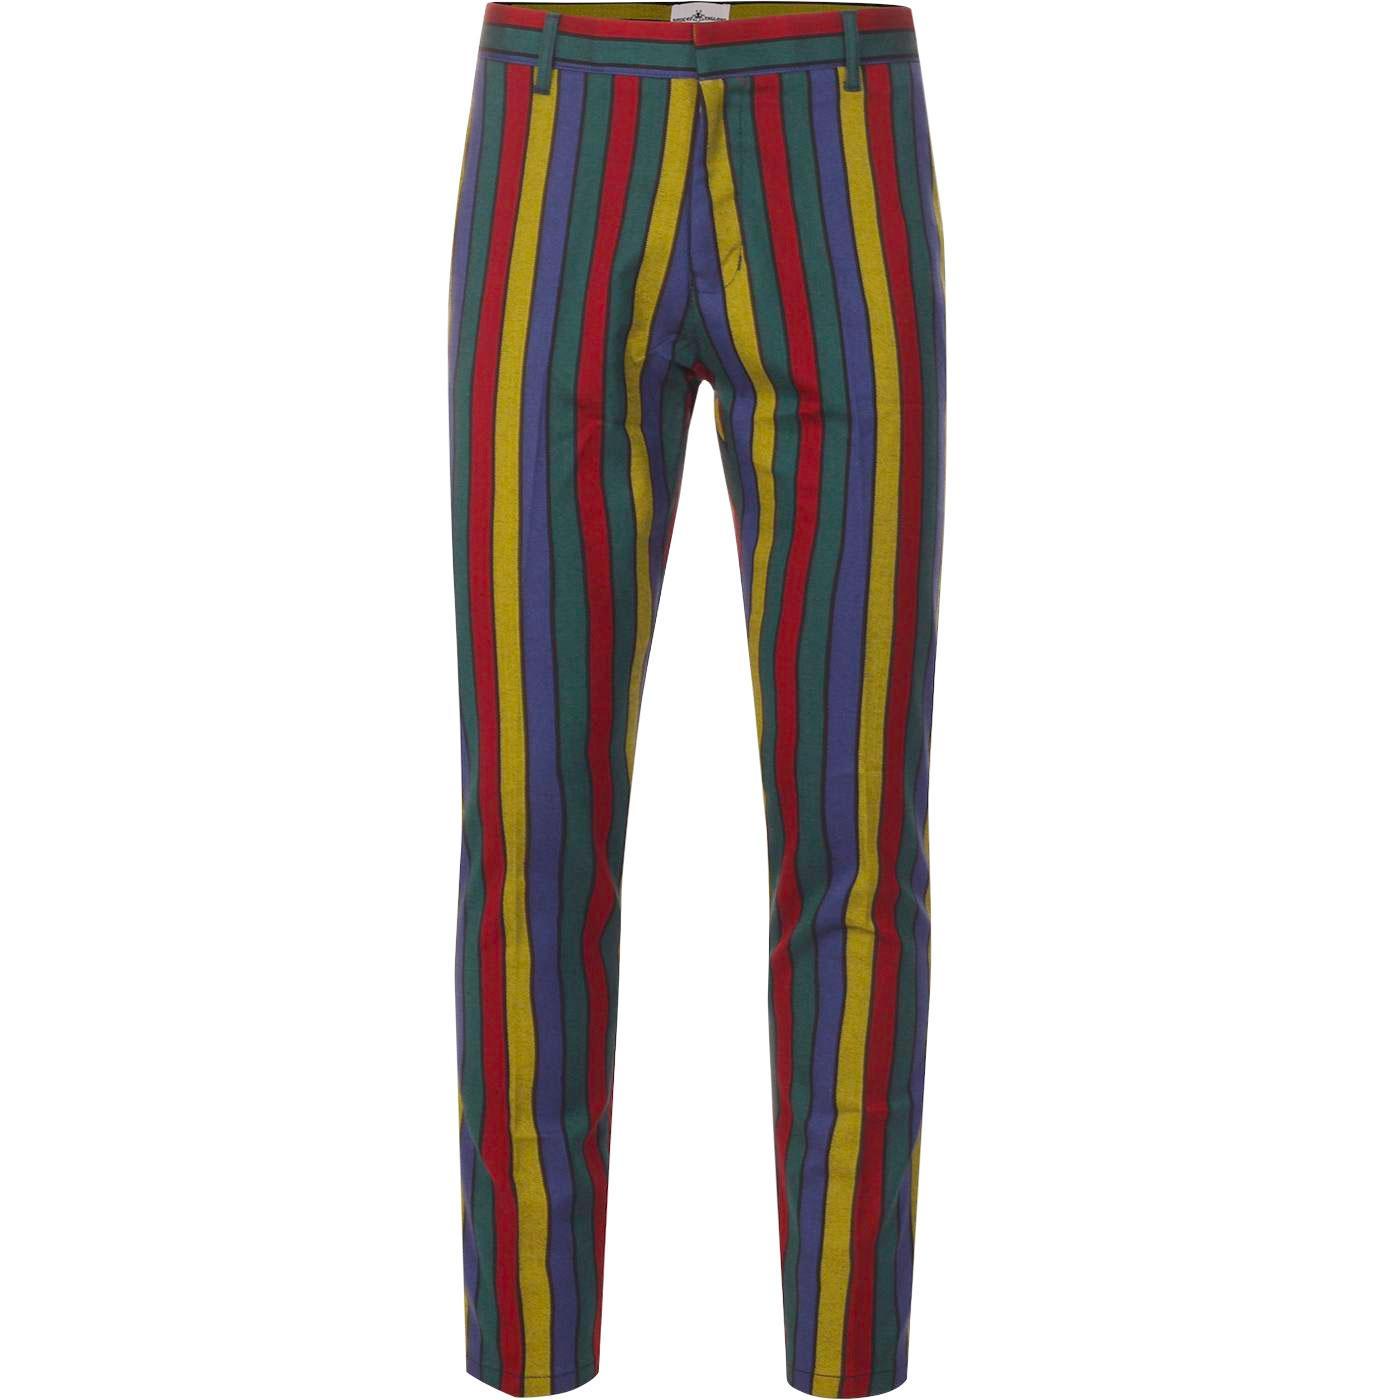 Hendrix Stripe MADCAP ENGLAND Retro Slim Trousers